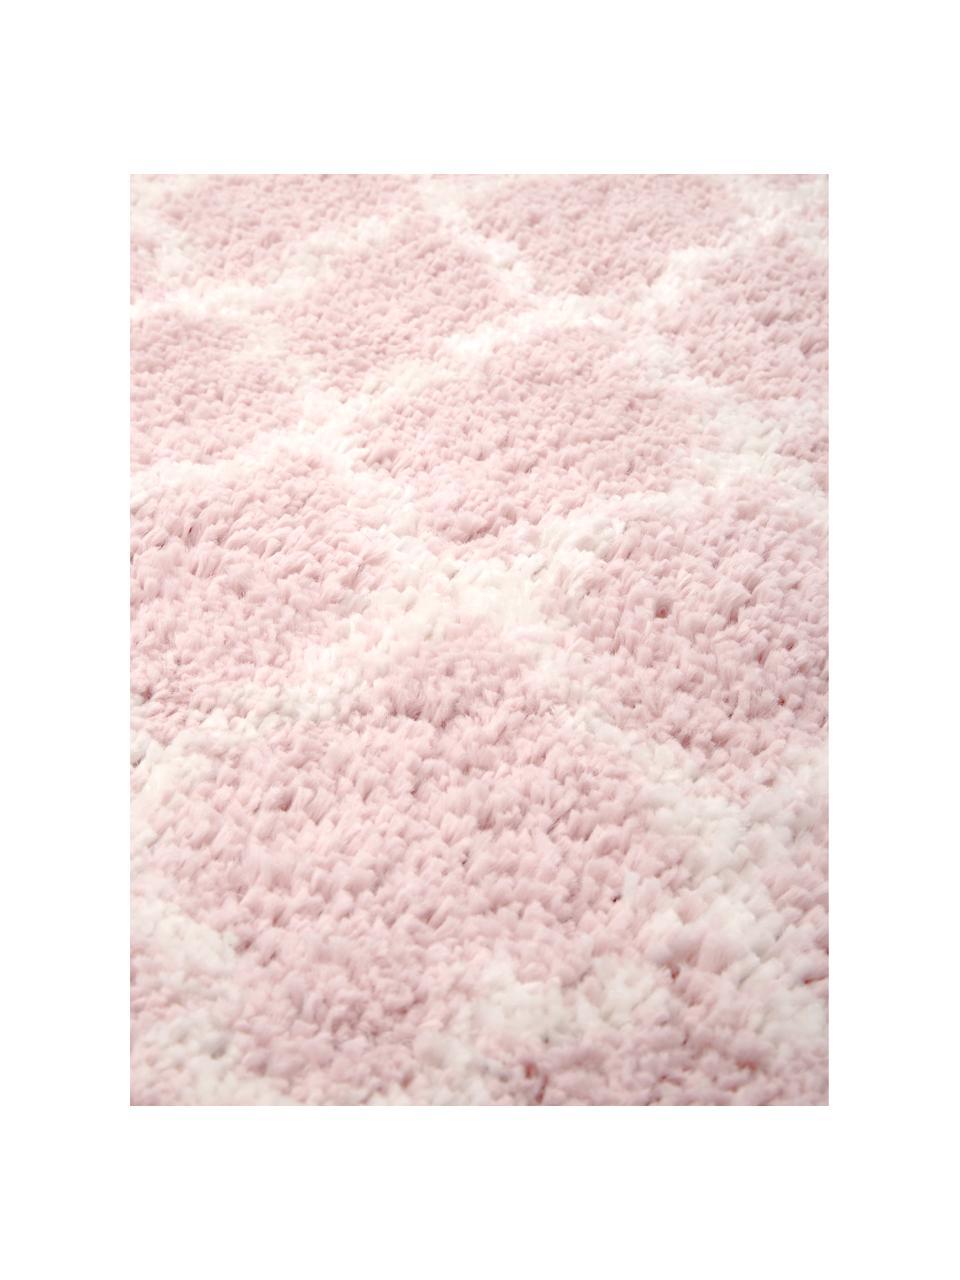 Hochflor-Teppich Mona in Altrosa/Creme, Flor: 100% Polypropylen, Altrosa, Cremeweiß, B 300 x L 400 cm (Größe XL)